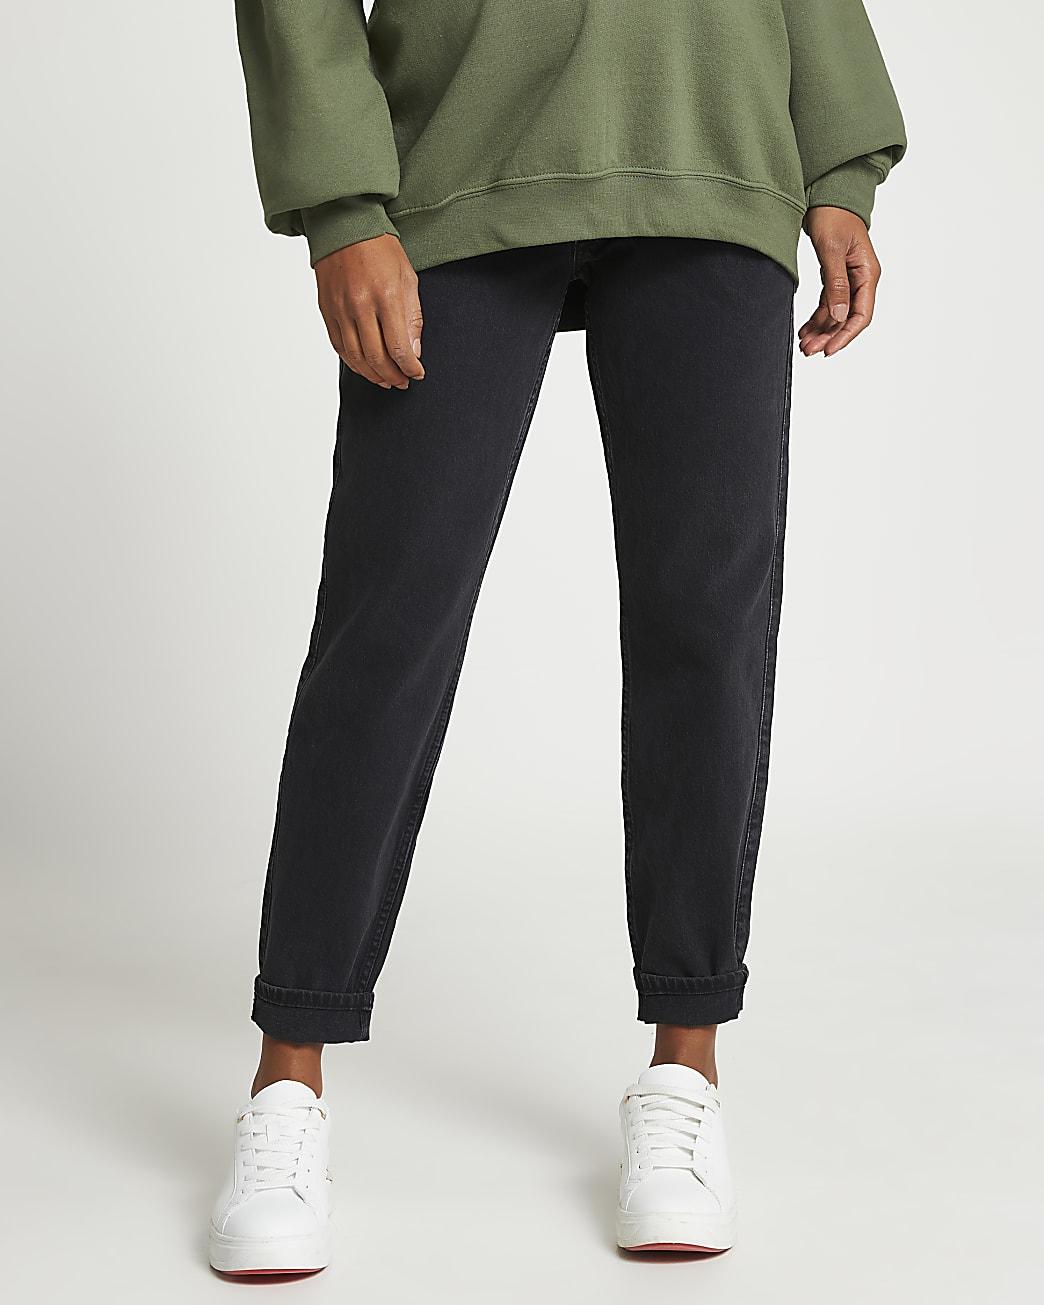 Black straight leg maternity mom jeans